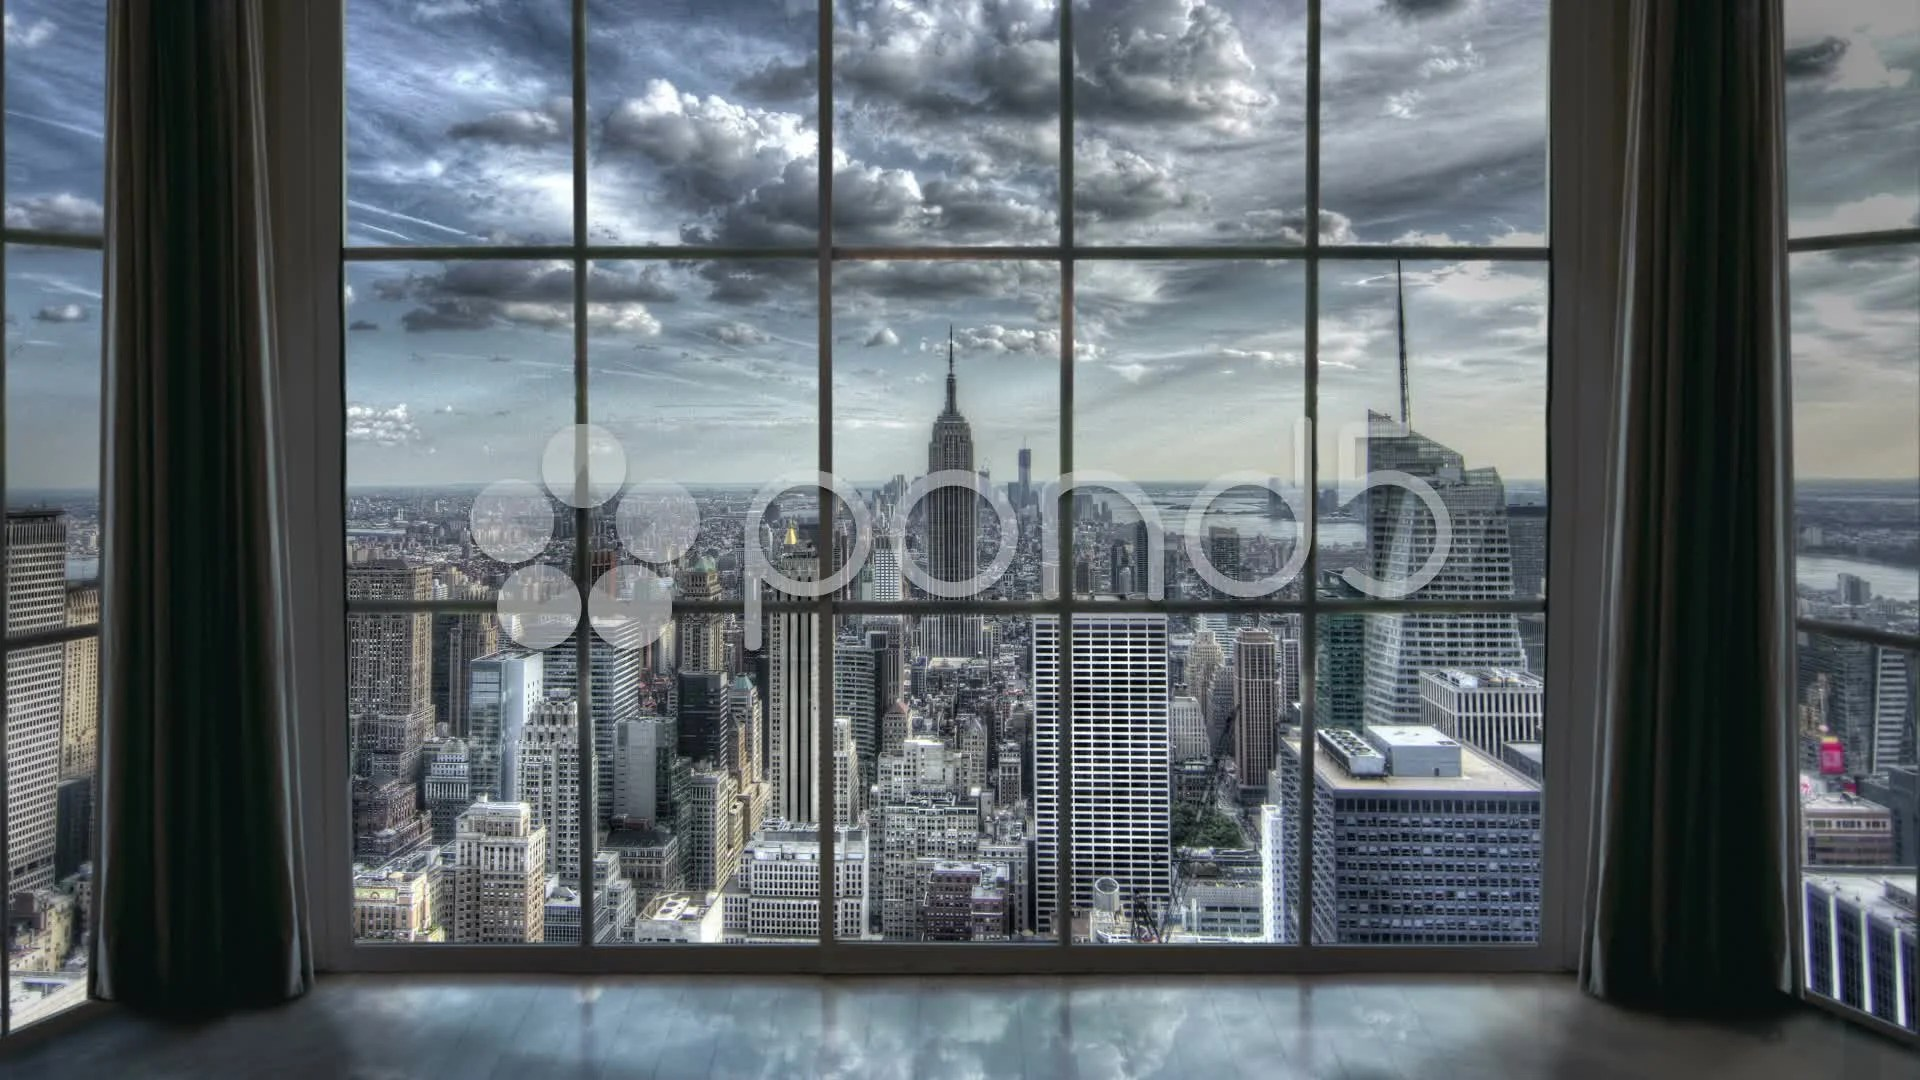 New York City View from Manhattan Apartment Window Empire